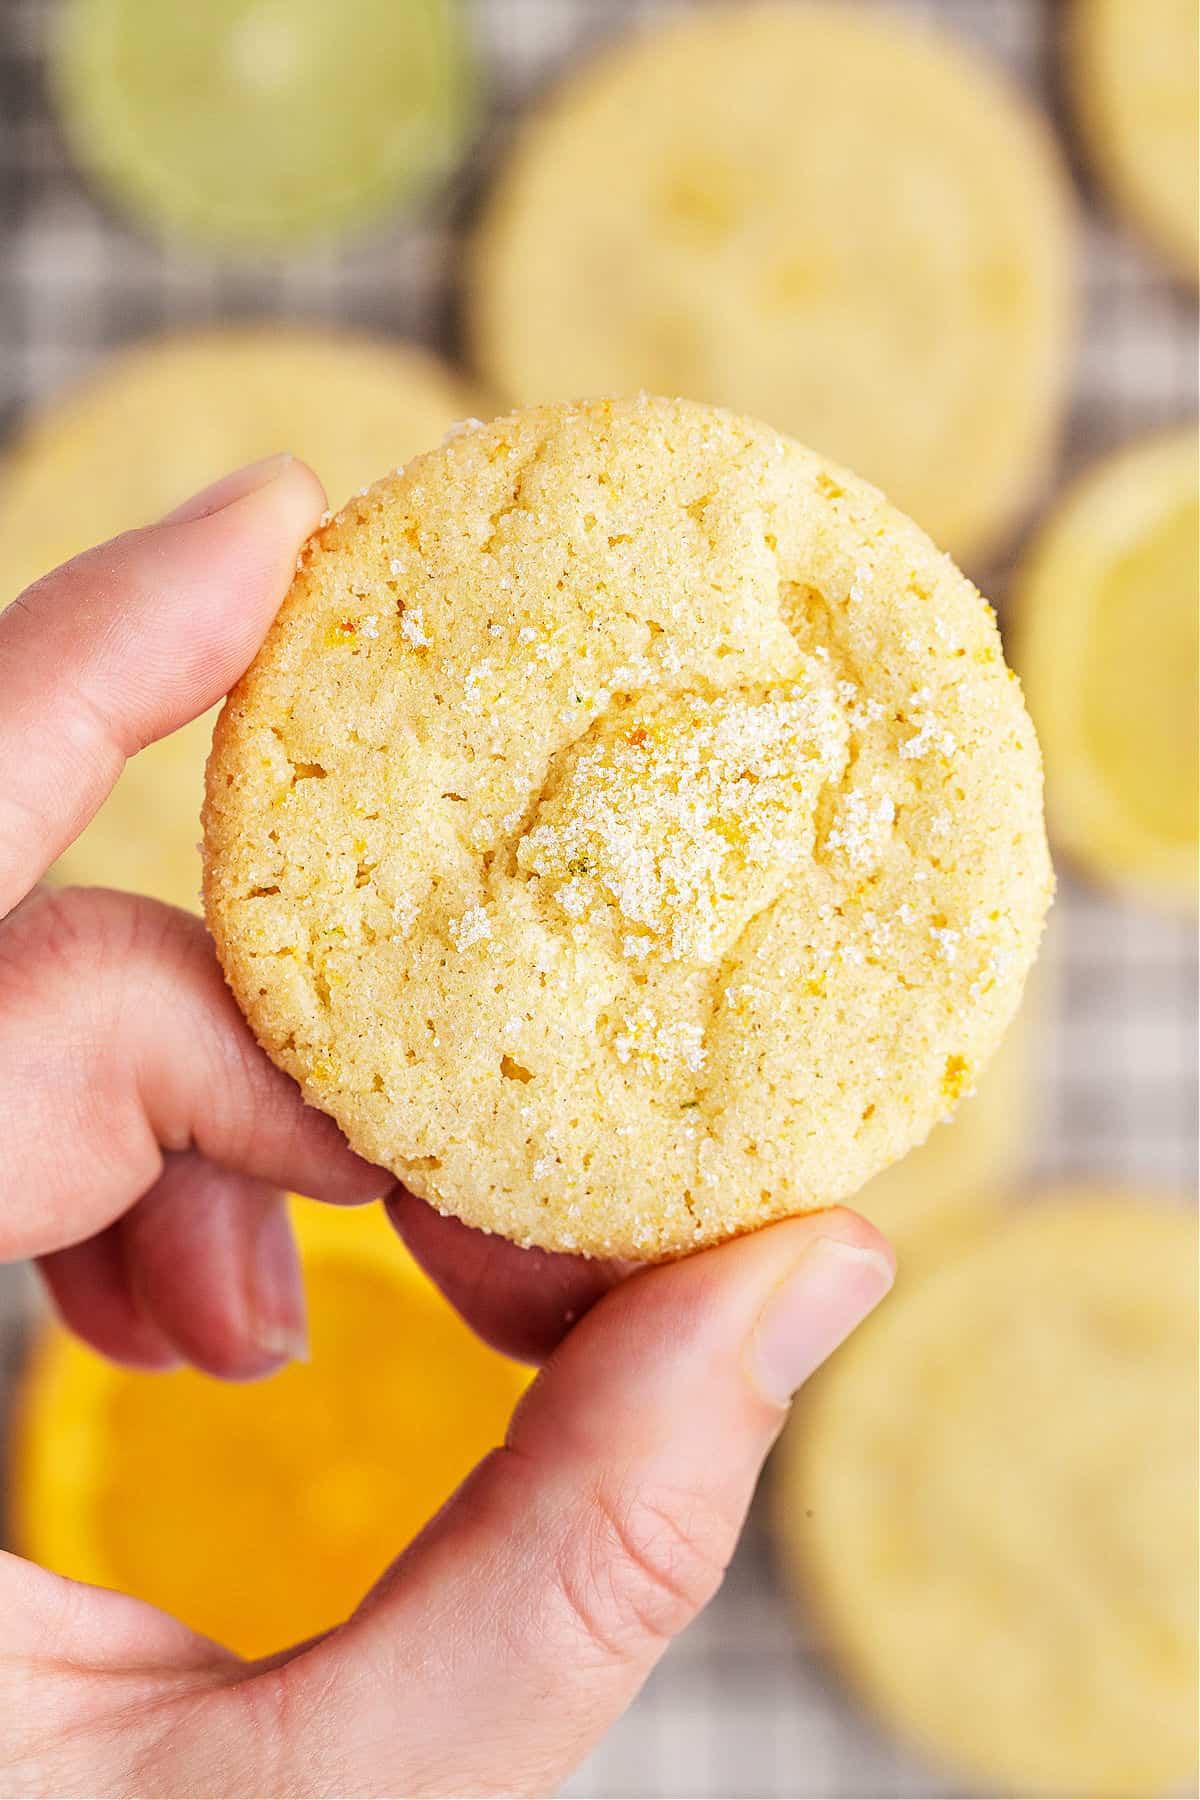 Sugar cookie with citrus flavor being held up.